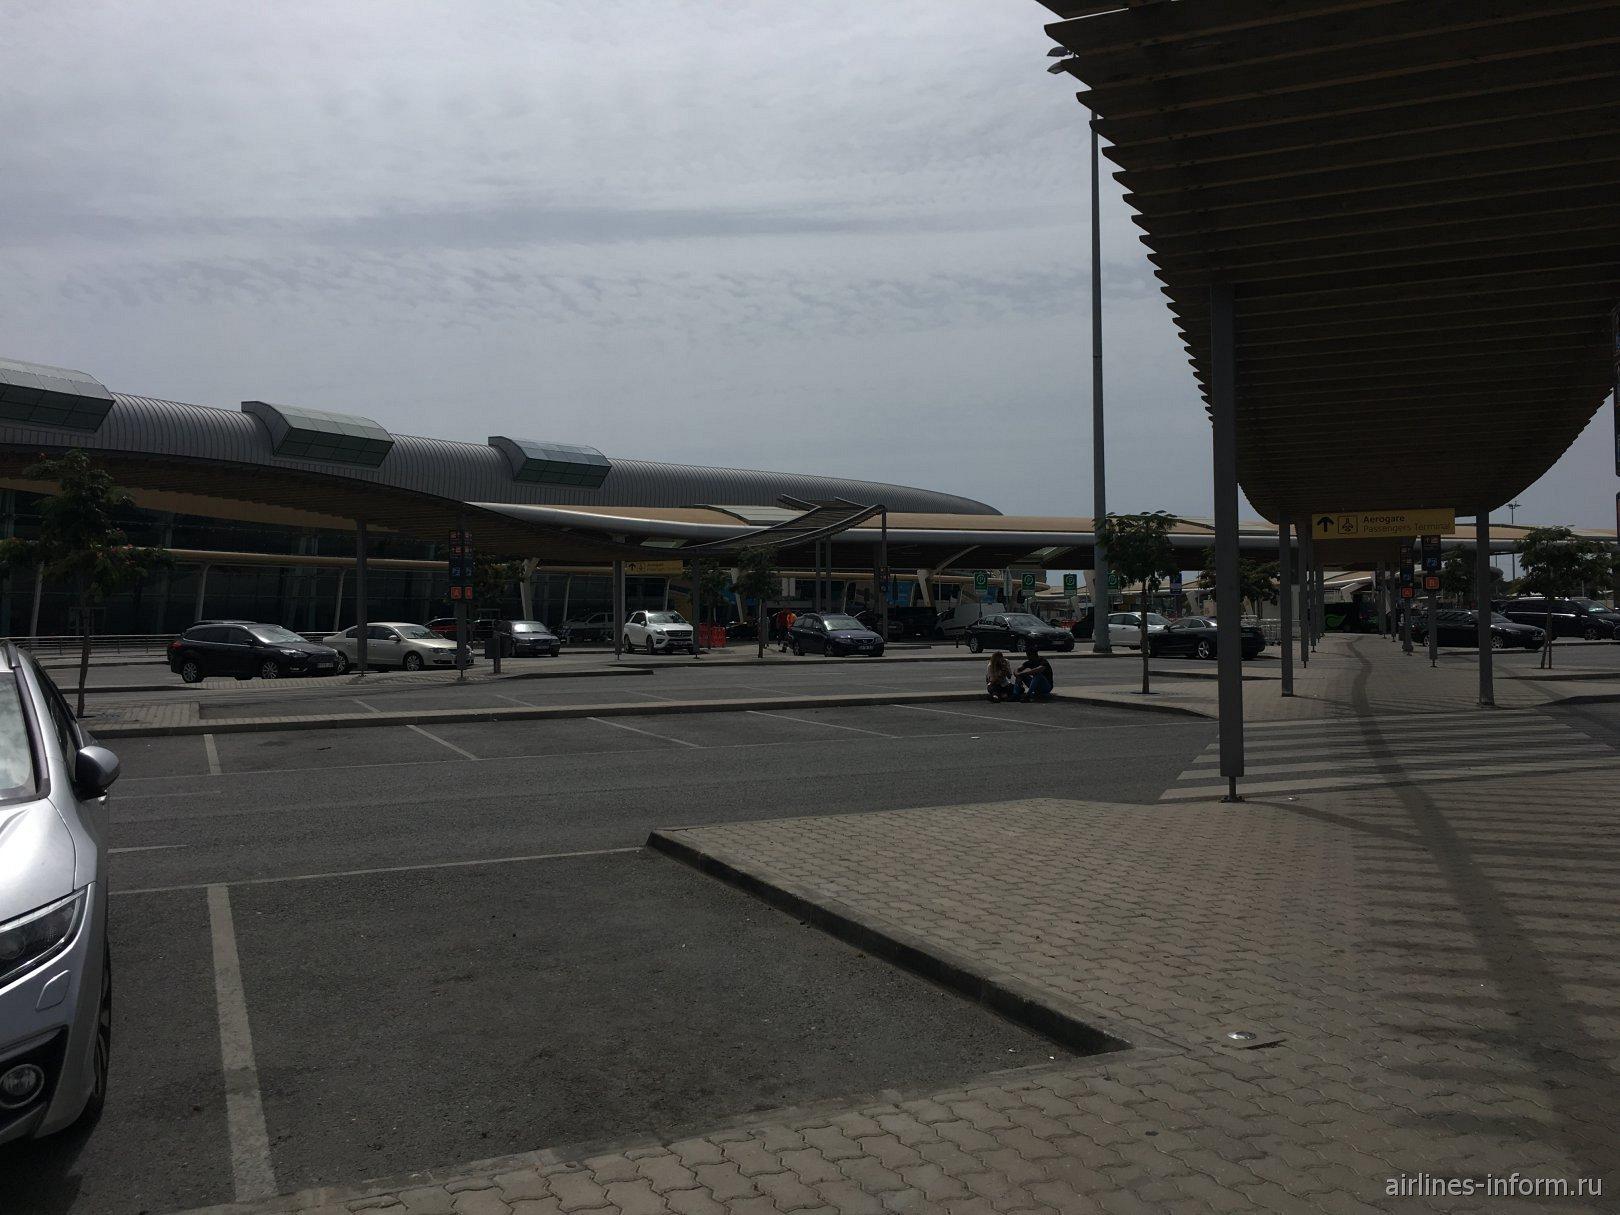 Пассажирский терминал аэропорта Фару